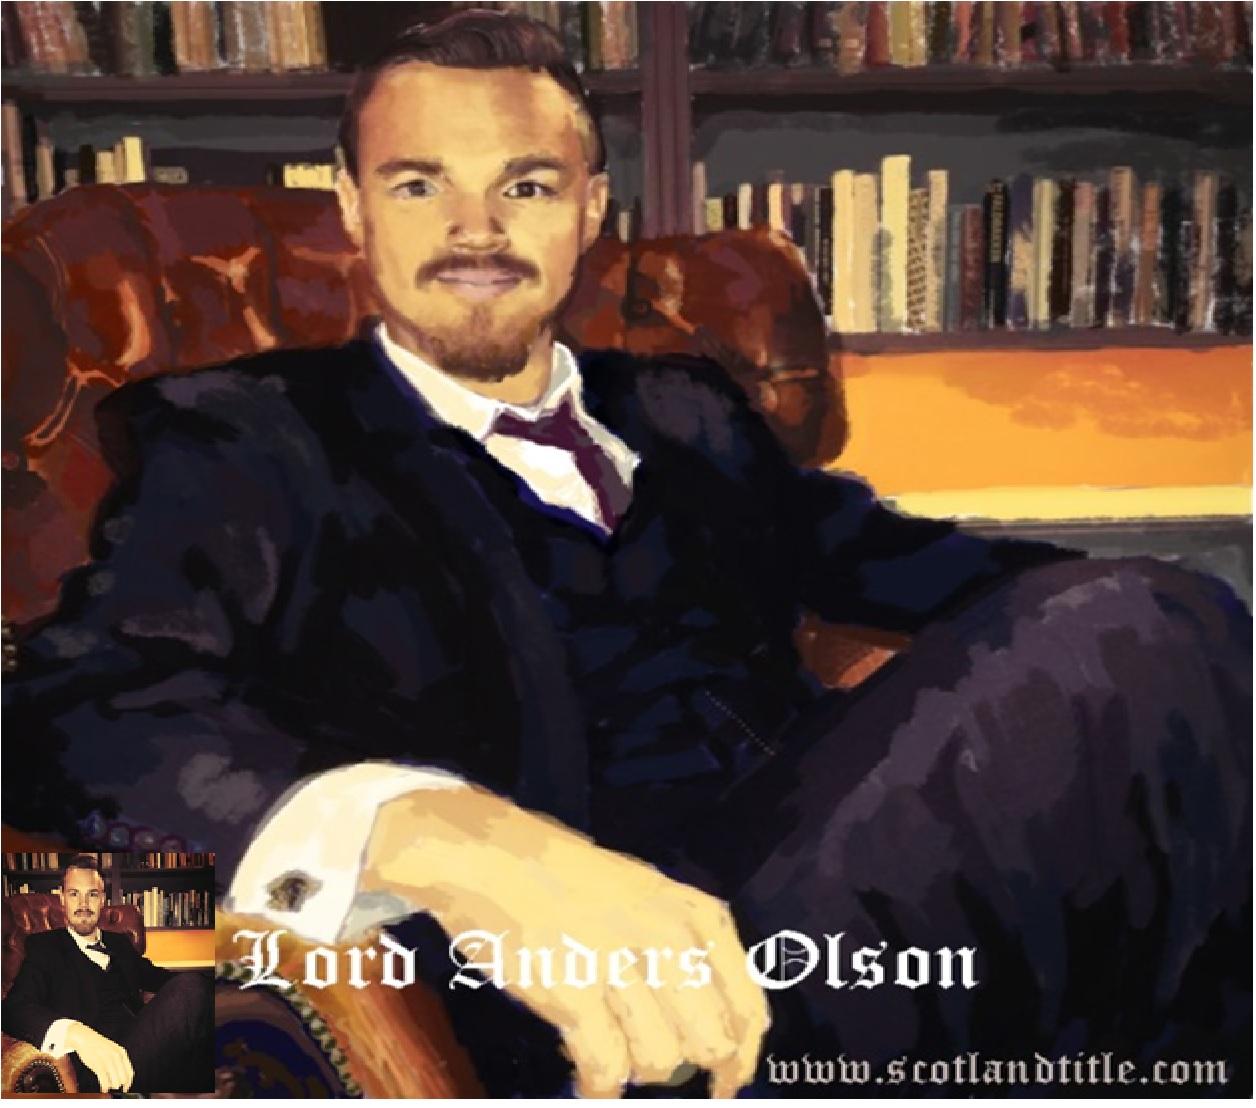 Lord Anders Olsson